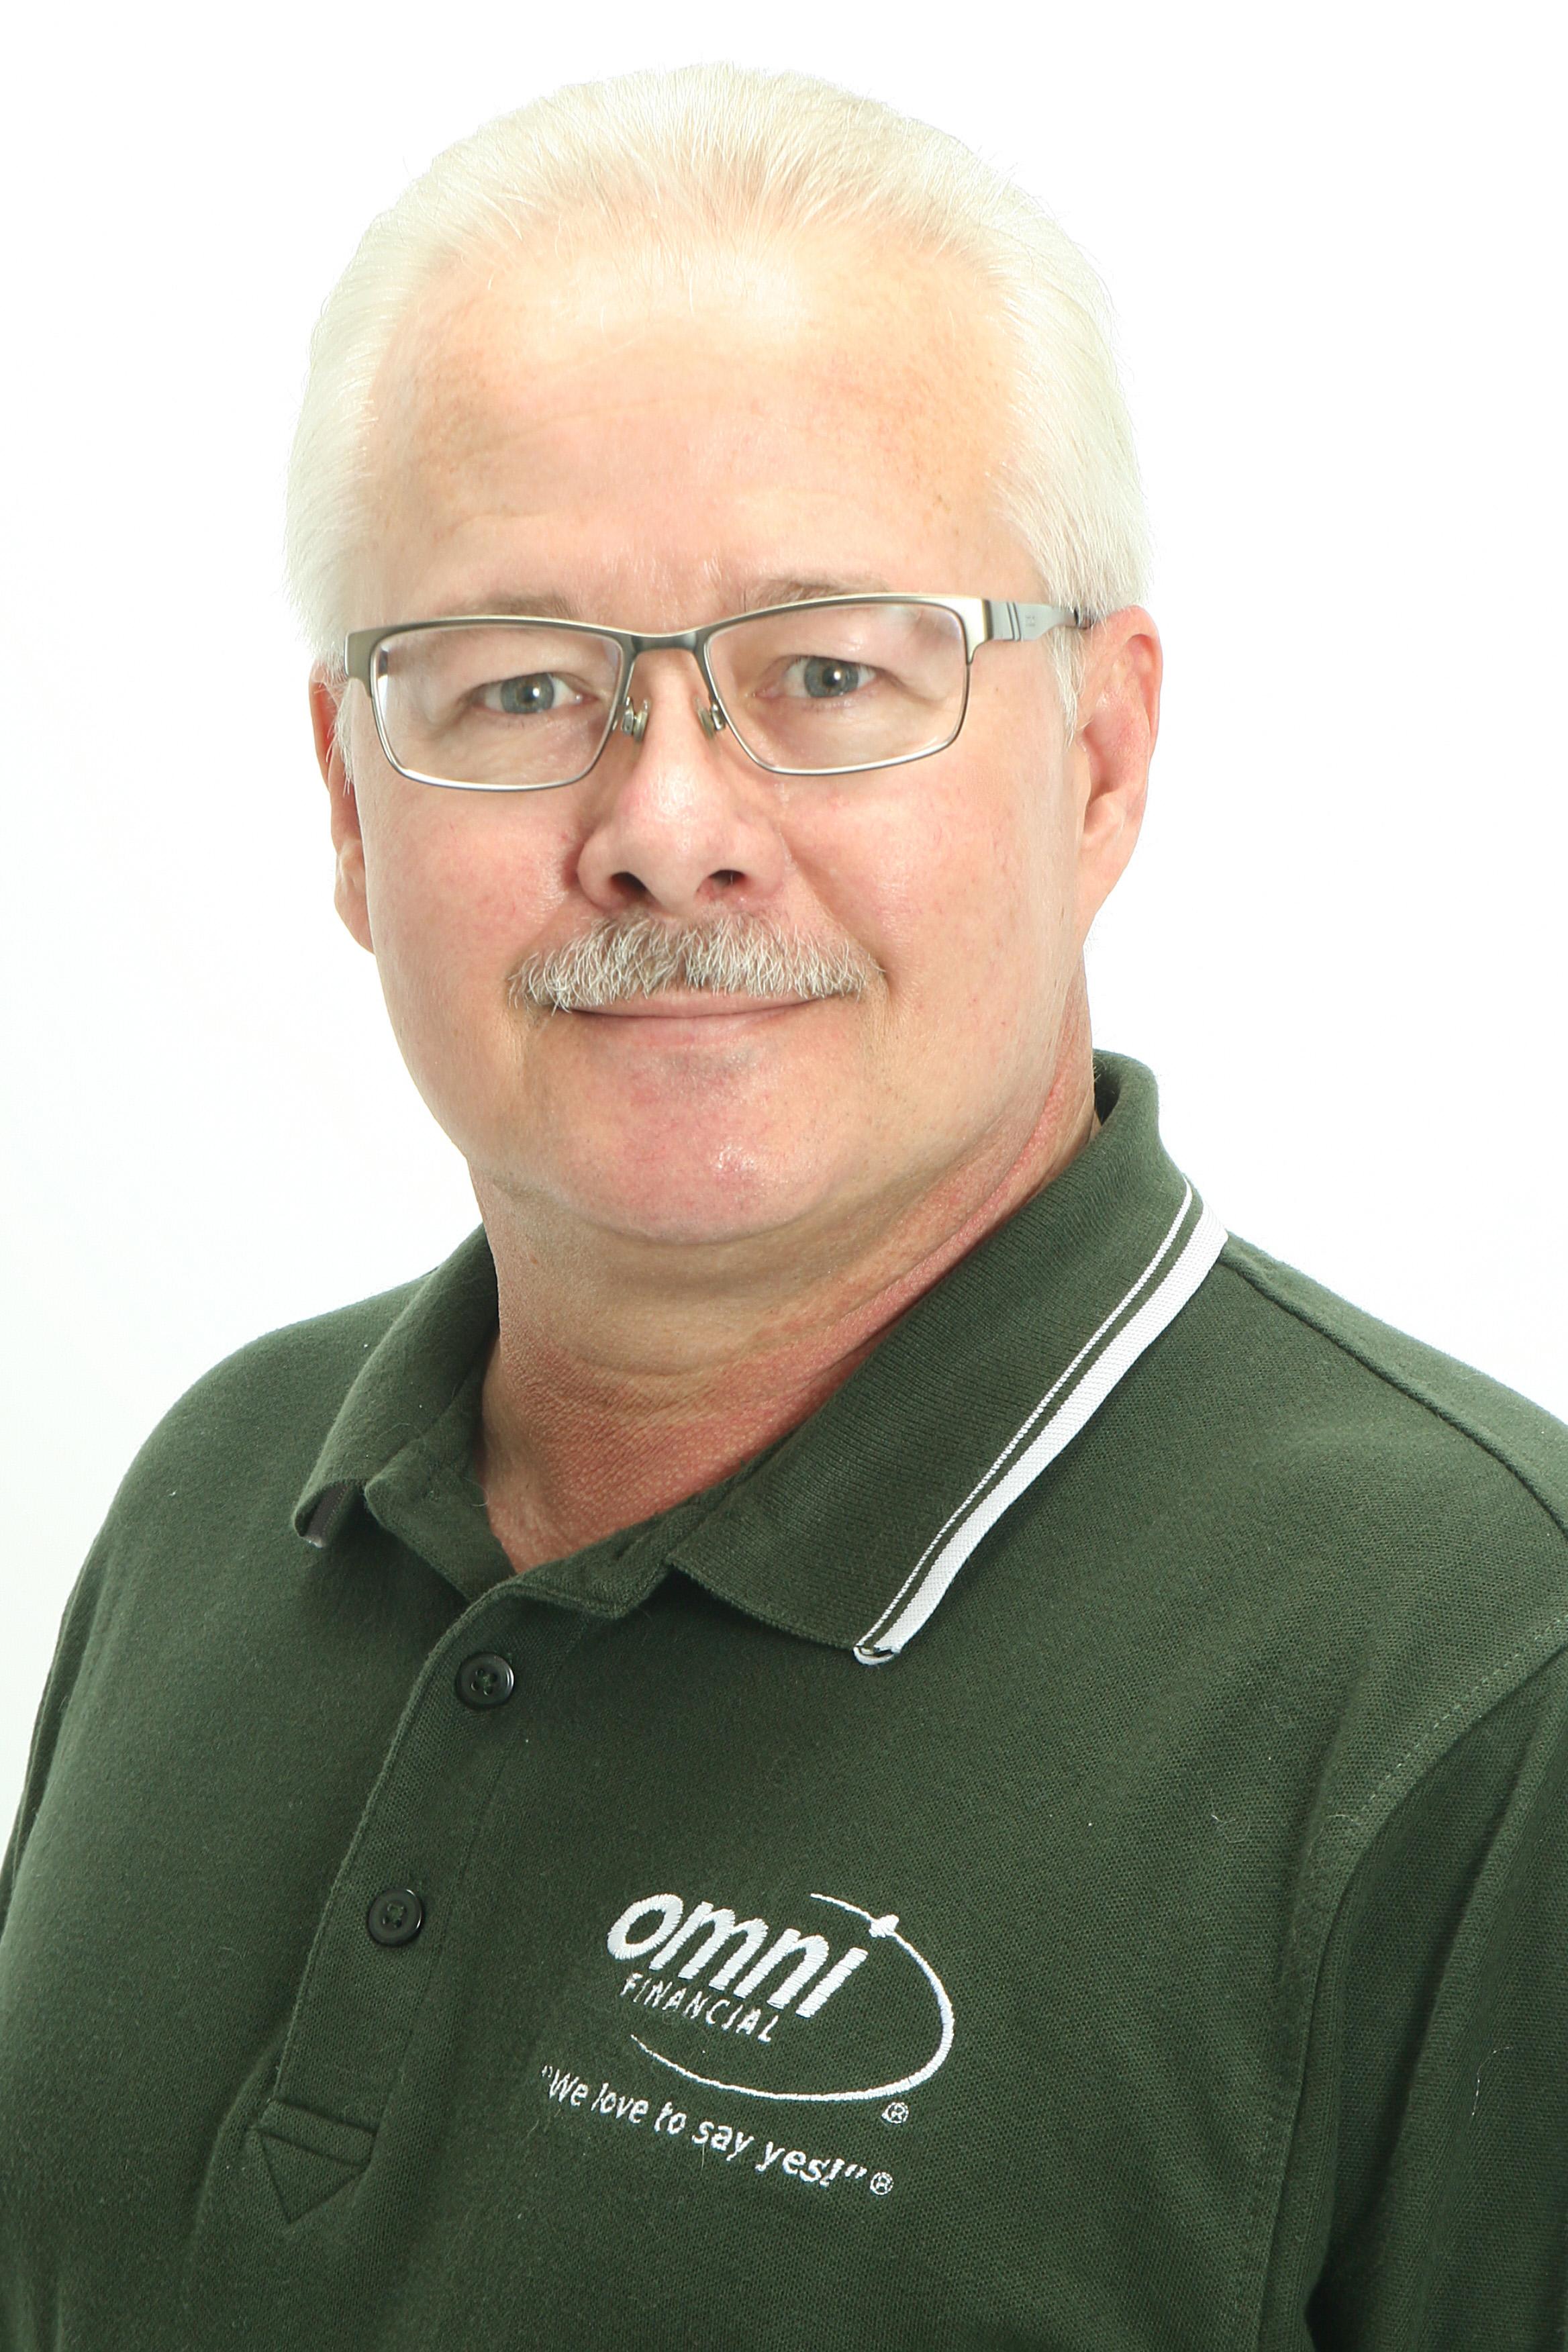 Omni-Military-Loans-Clarksville-Manager-Don-Hunt.jpg